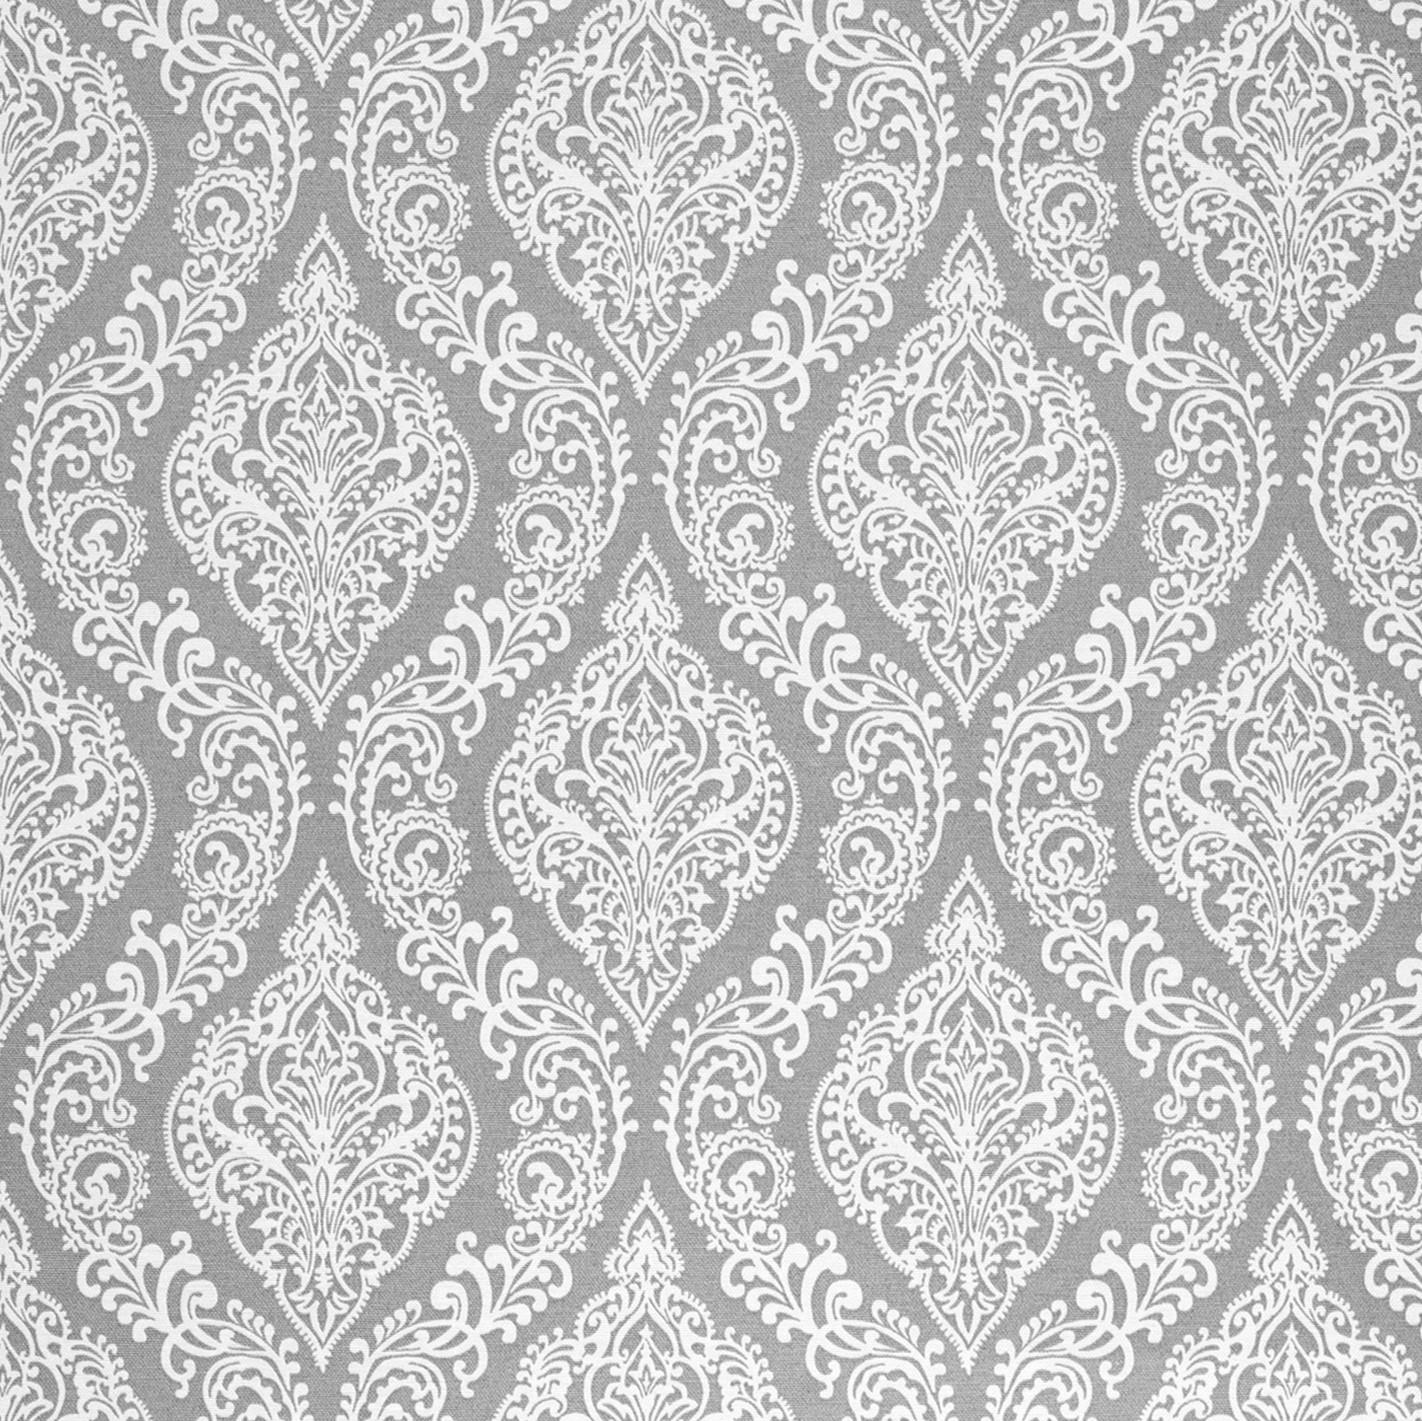 Mantel VICTORIANGRIS Rectangular 1,2x1,7m [enstockpara envíooretiro]